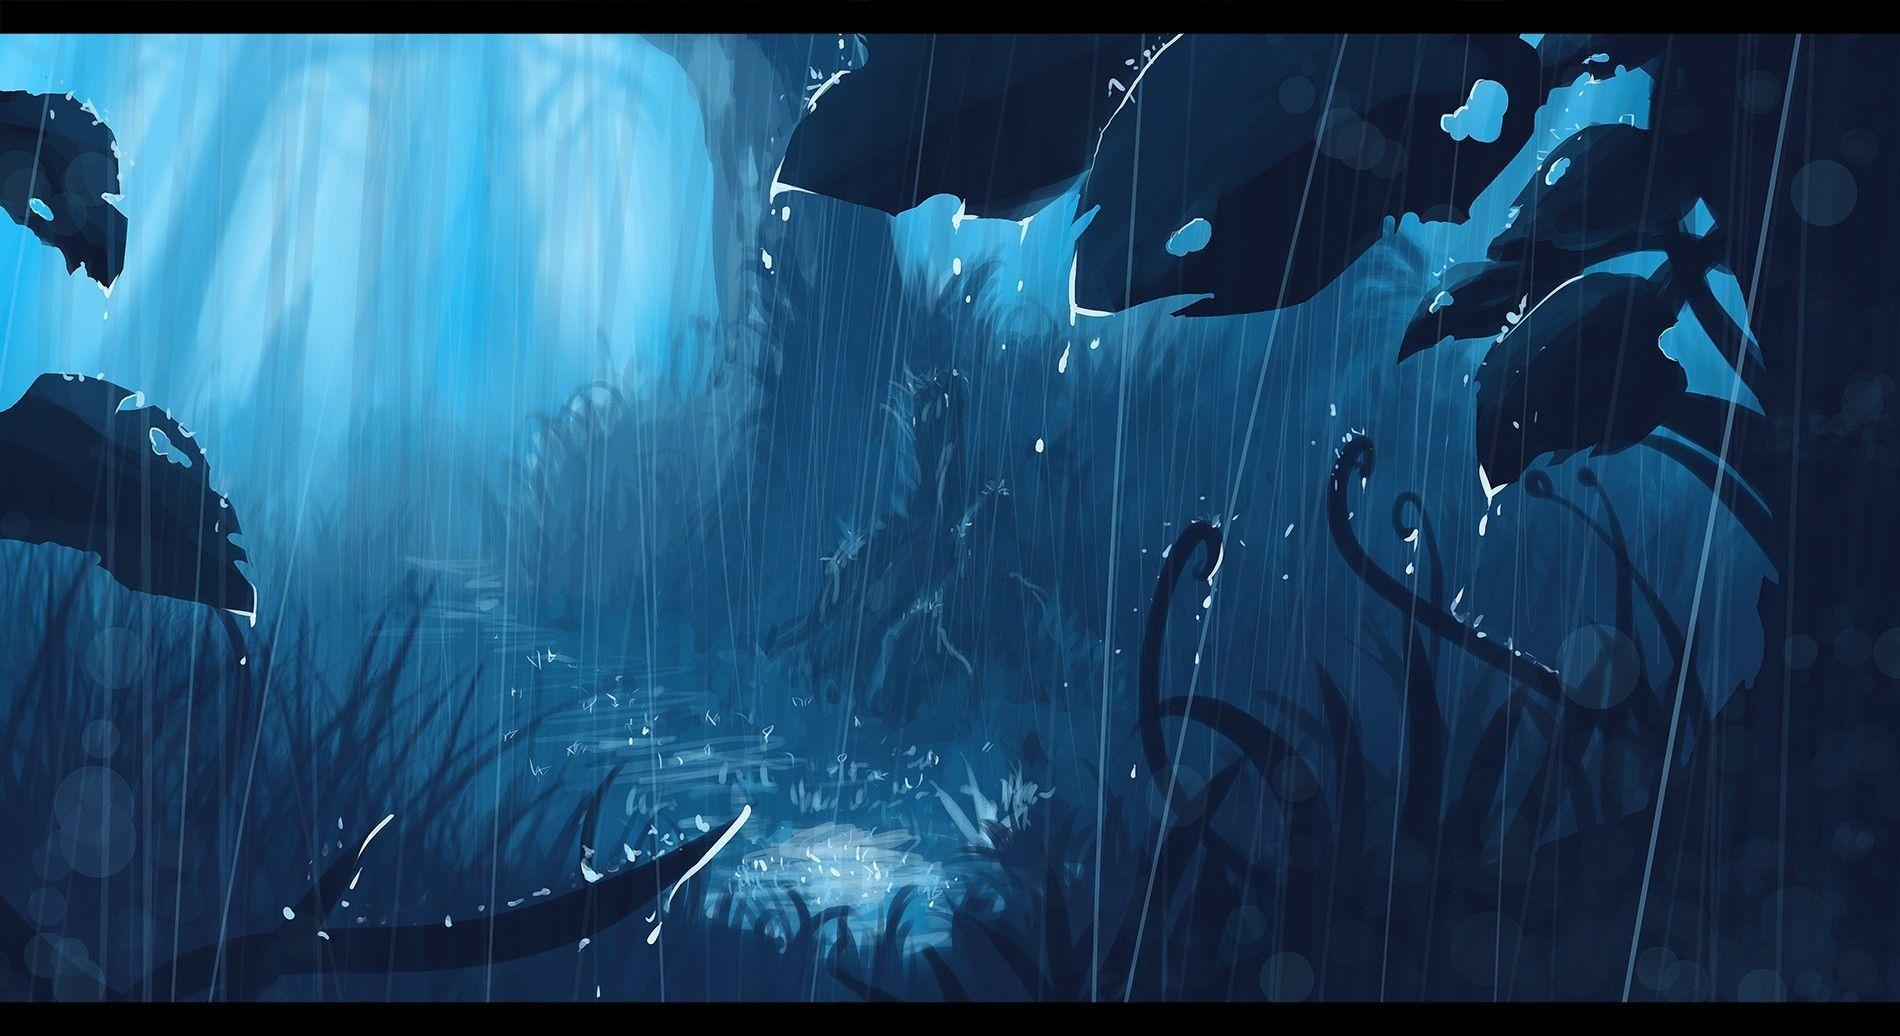 Anime Rain Scenery Wallpapers Top Free Anime Rain Scenery Backgrounds Wallpaperaccess